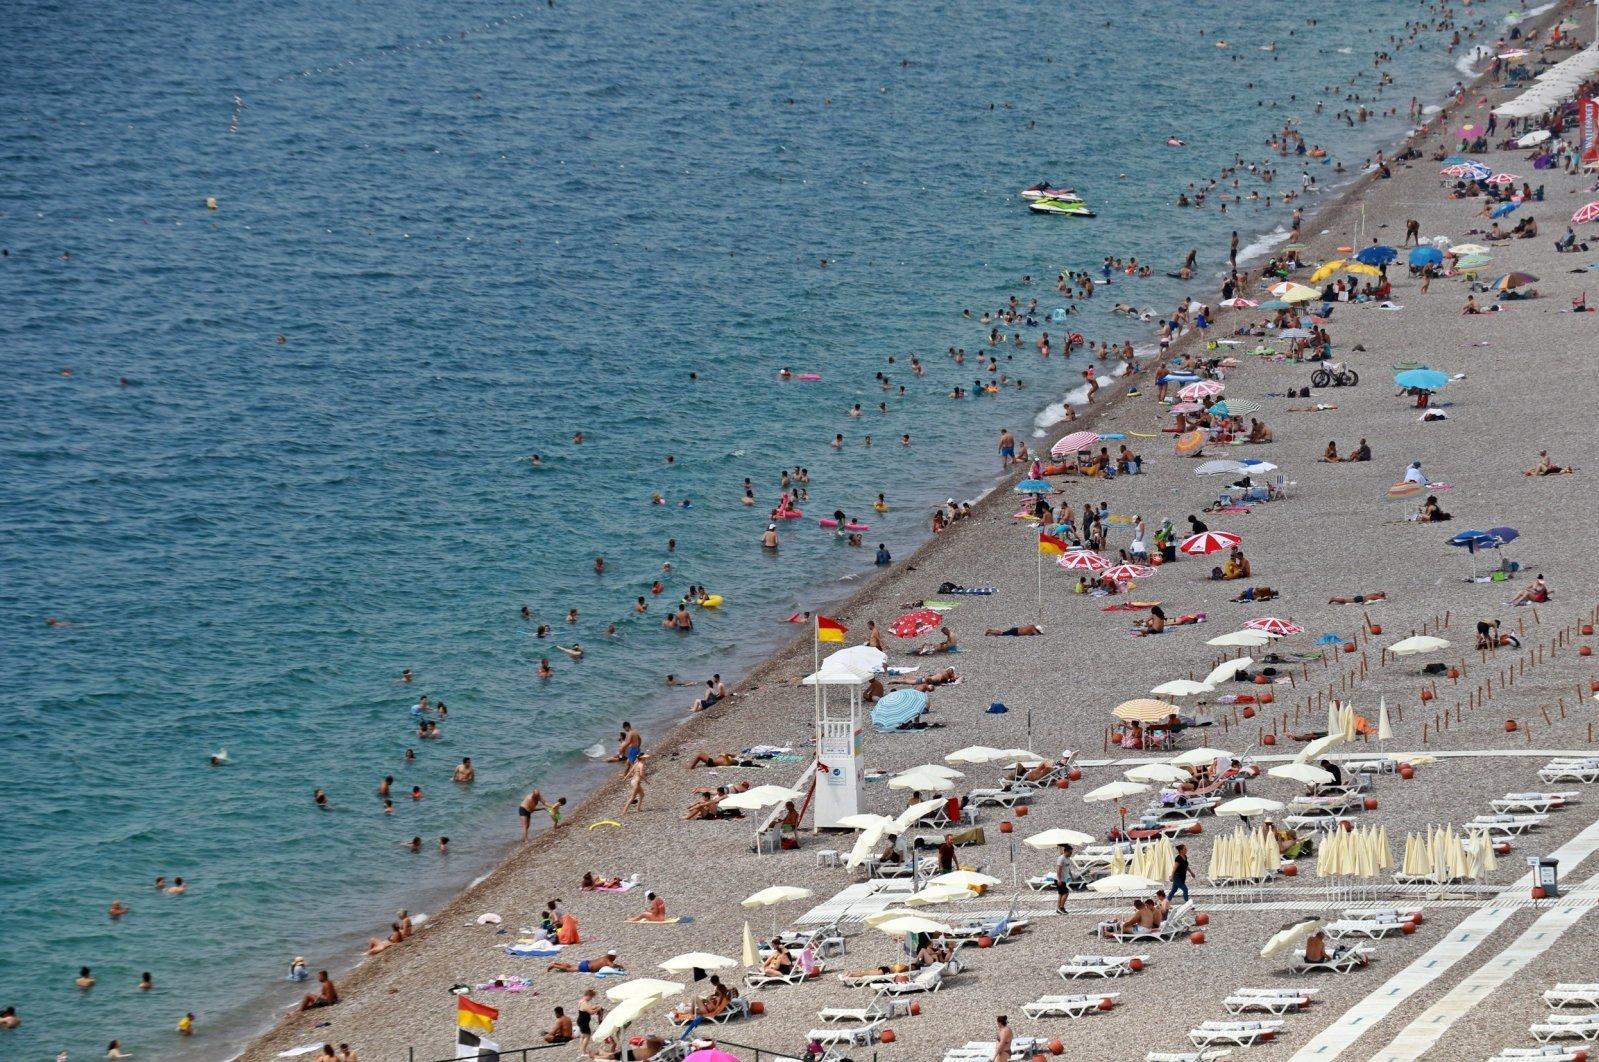 People are seen on a beach in the Mediterranean resort city of Antalya, Turkey, Aug. 4, 2020. (IHA Photo)